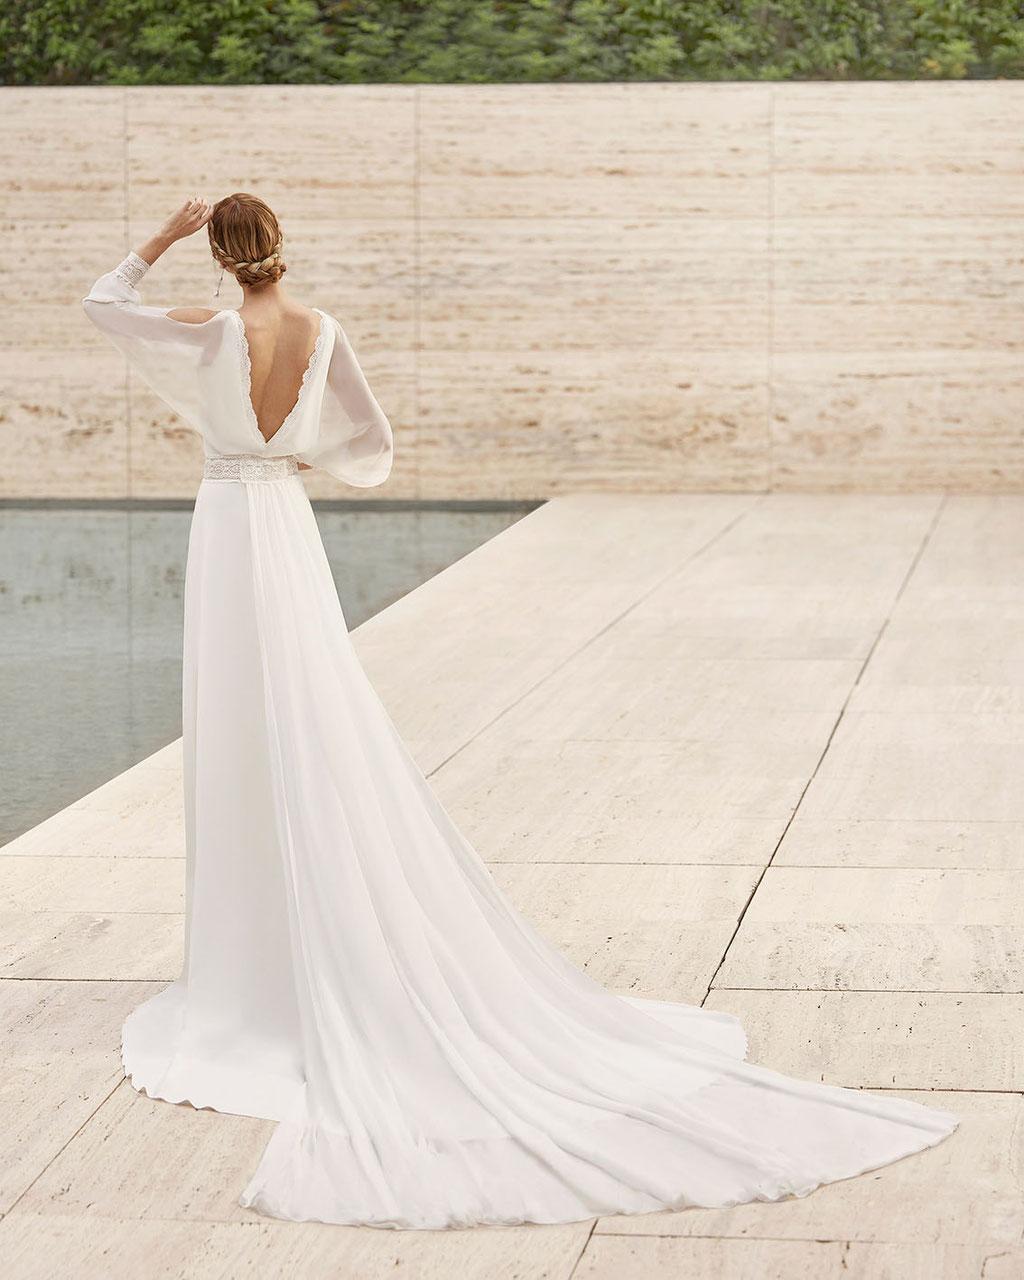 Elkan. Rosa Clará Couture 2021.